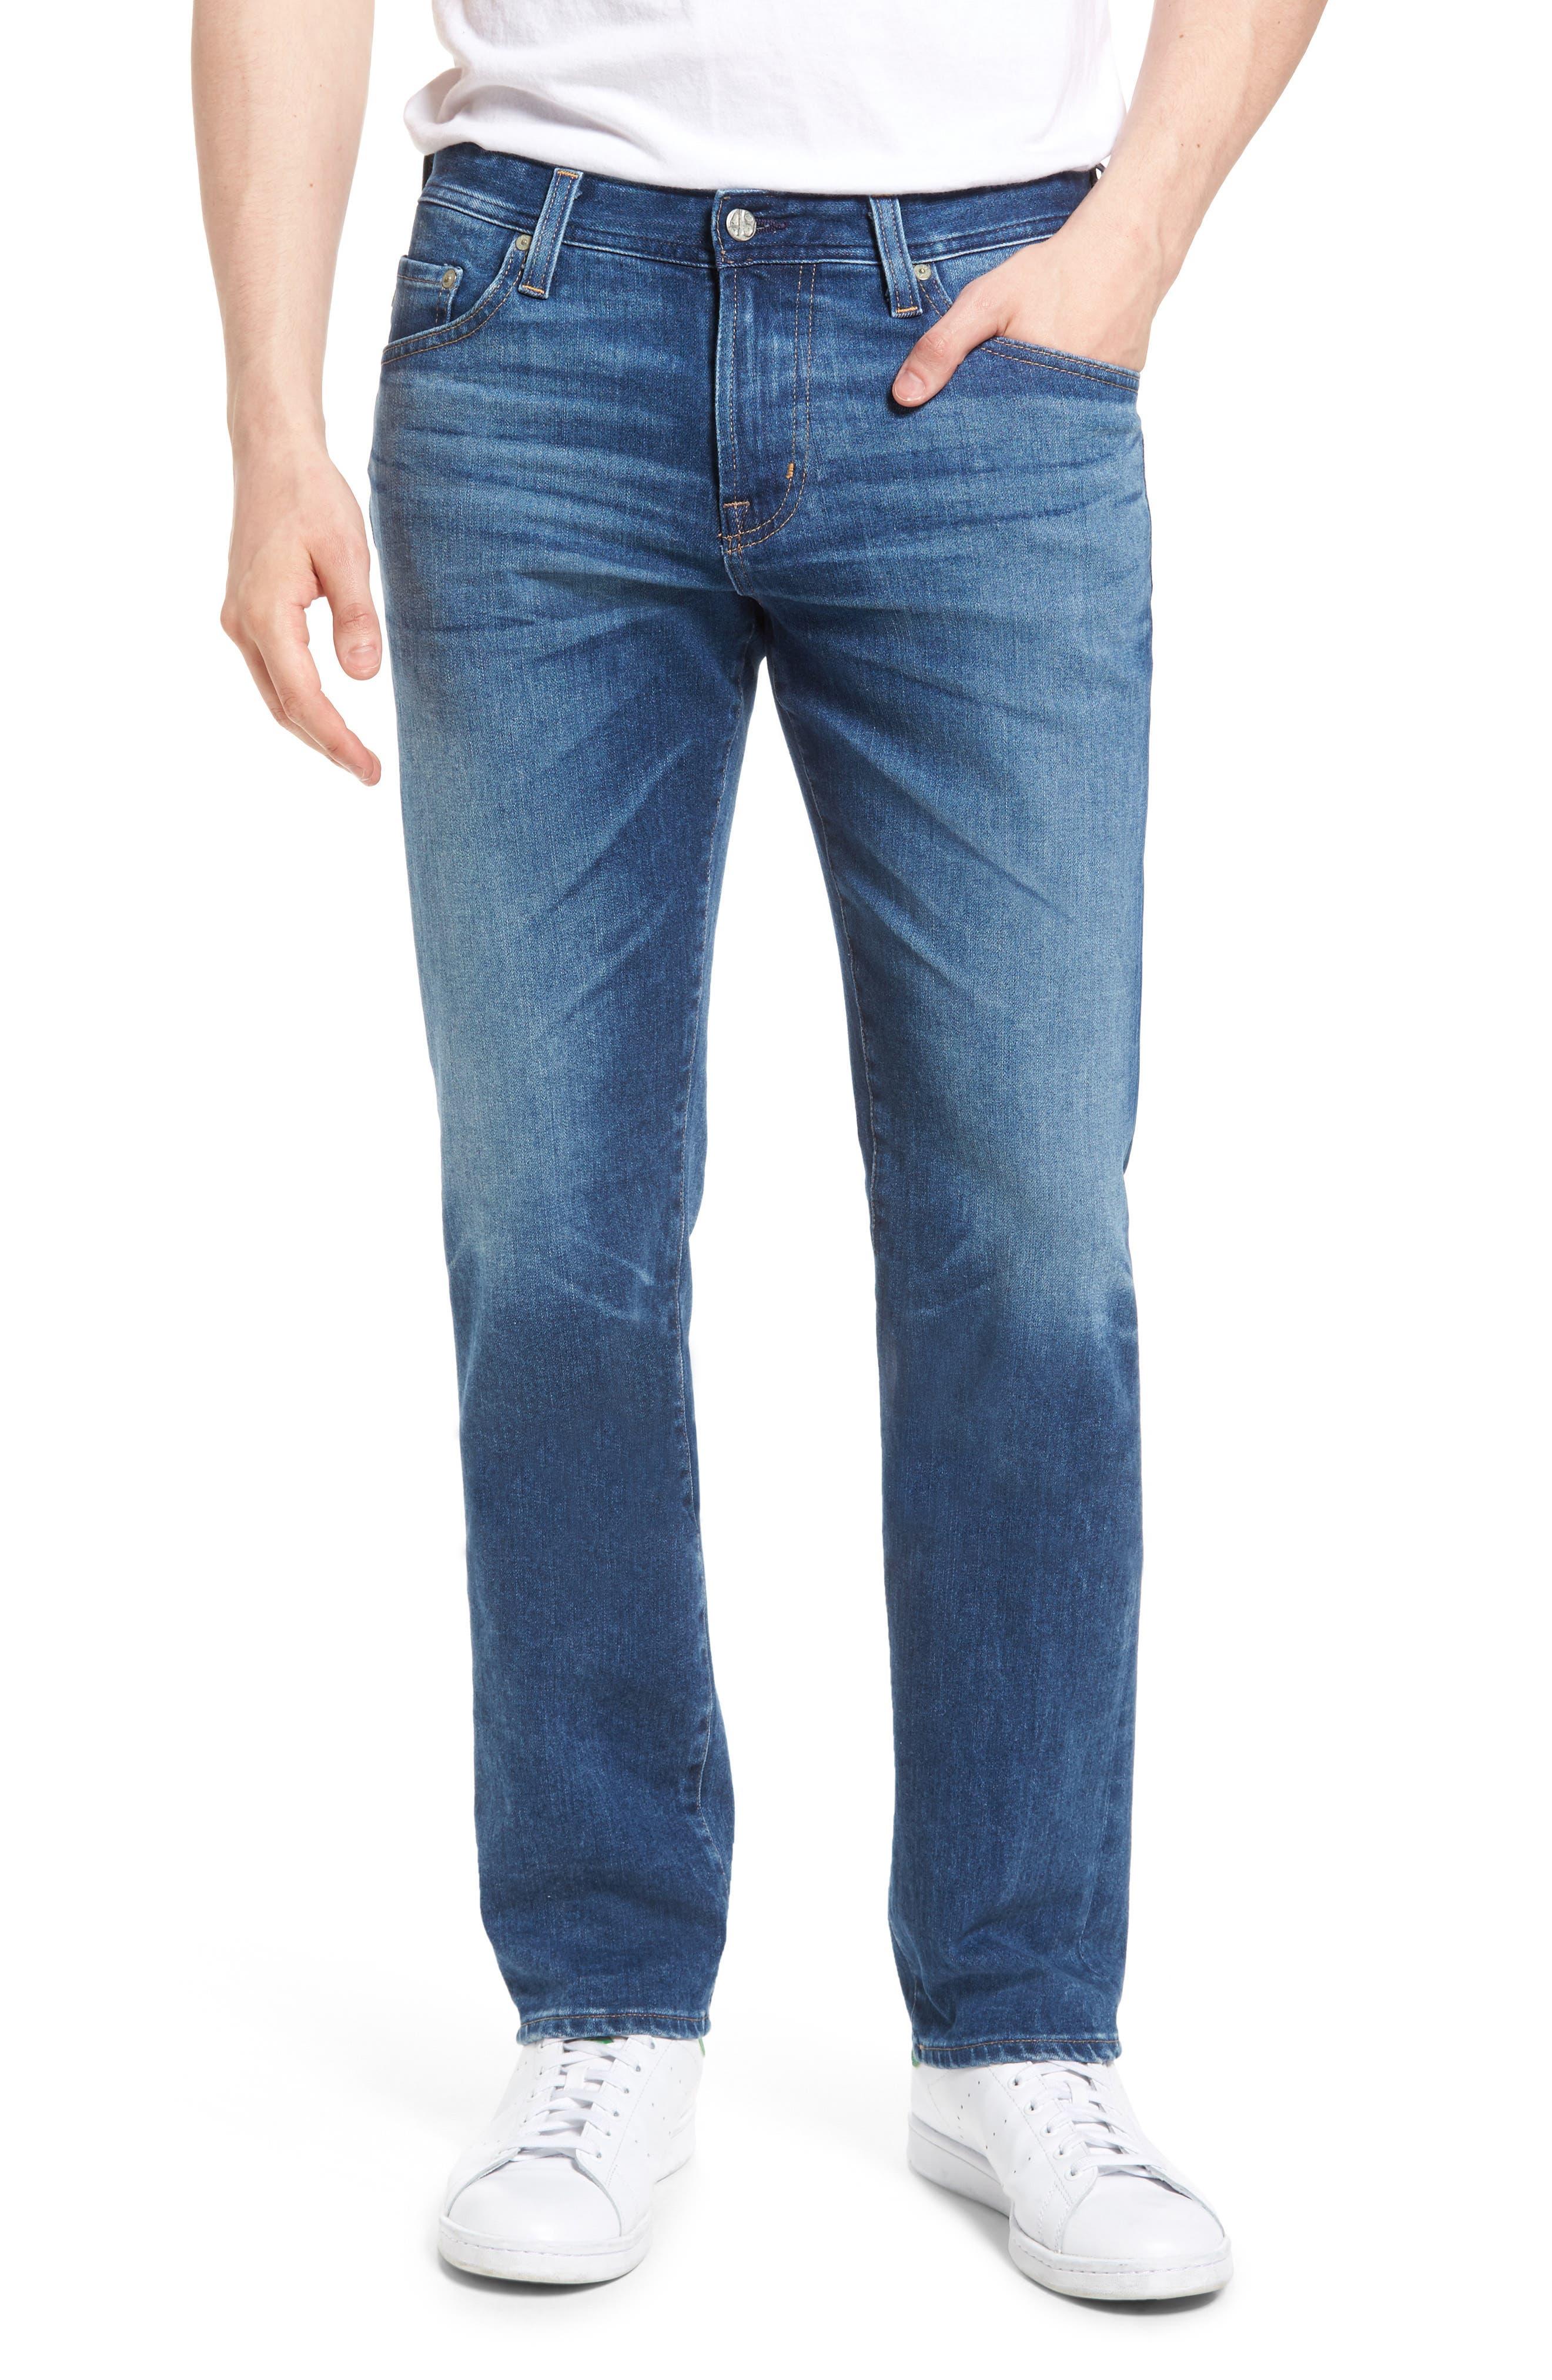 Graduate Slim Straight Leg Jeans,                         Main,                         color, 11 Years Delom